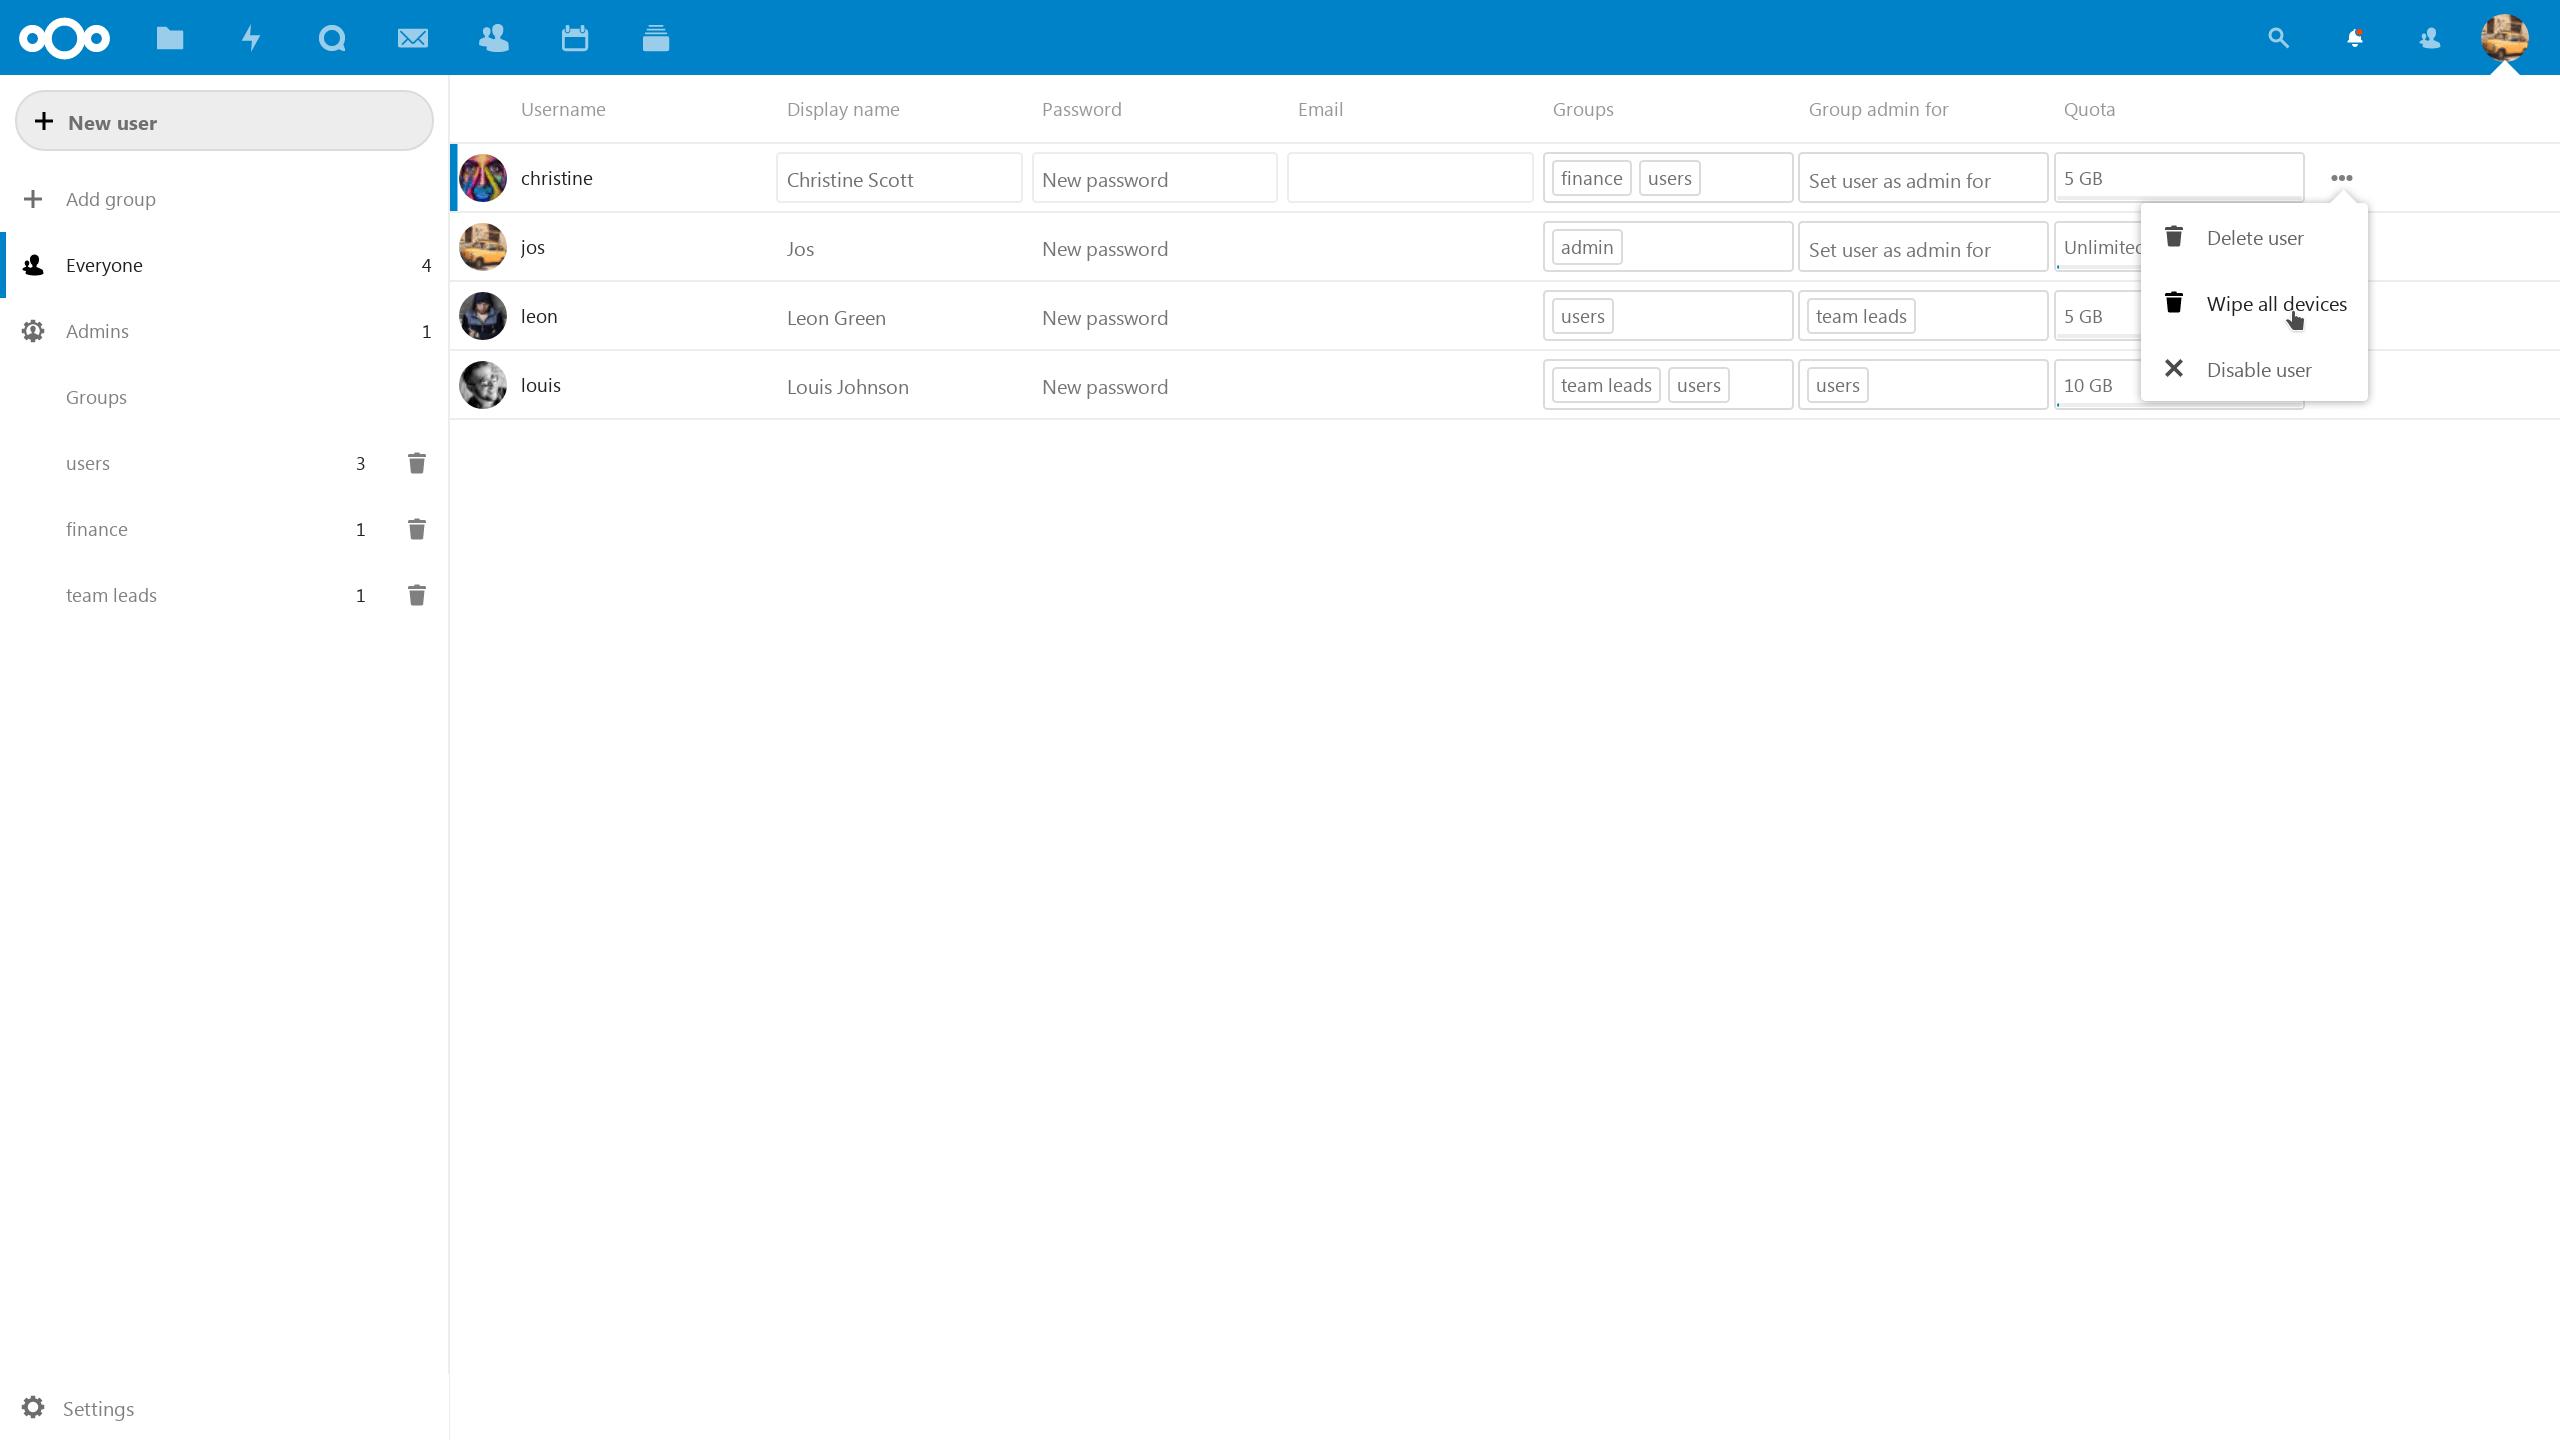 Remote wipe as admin, per user